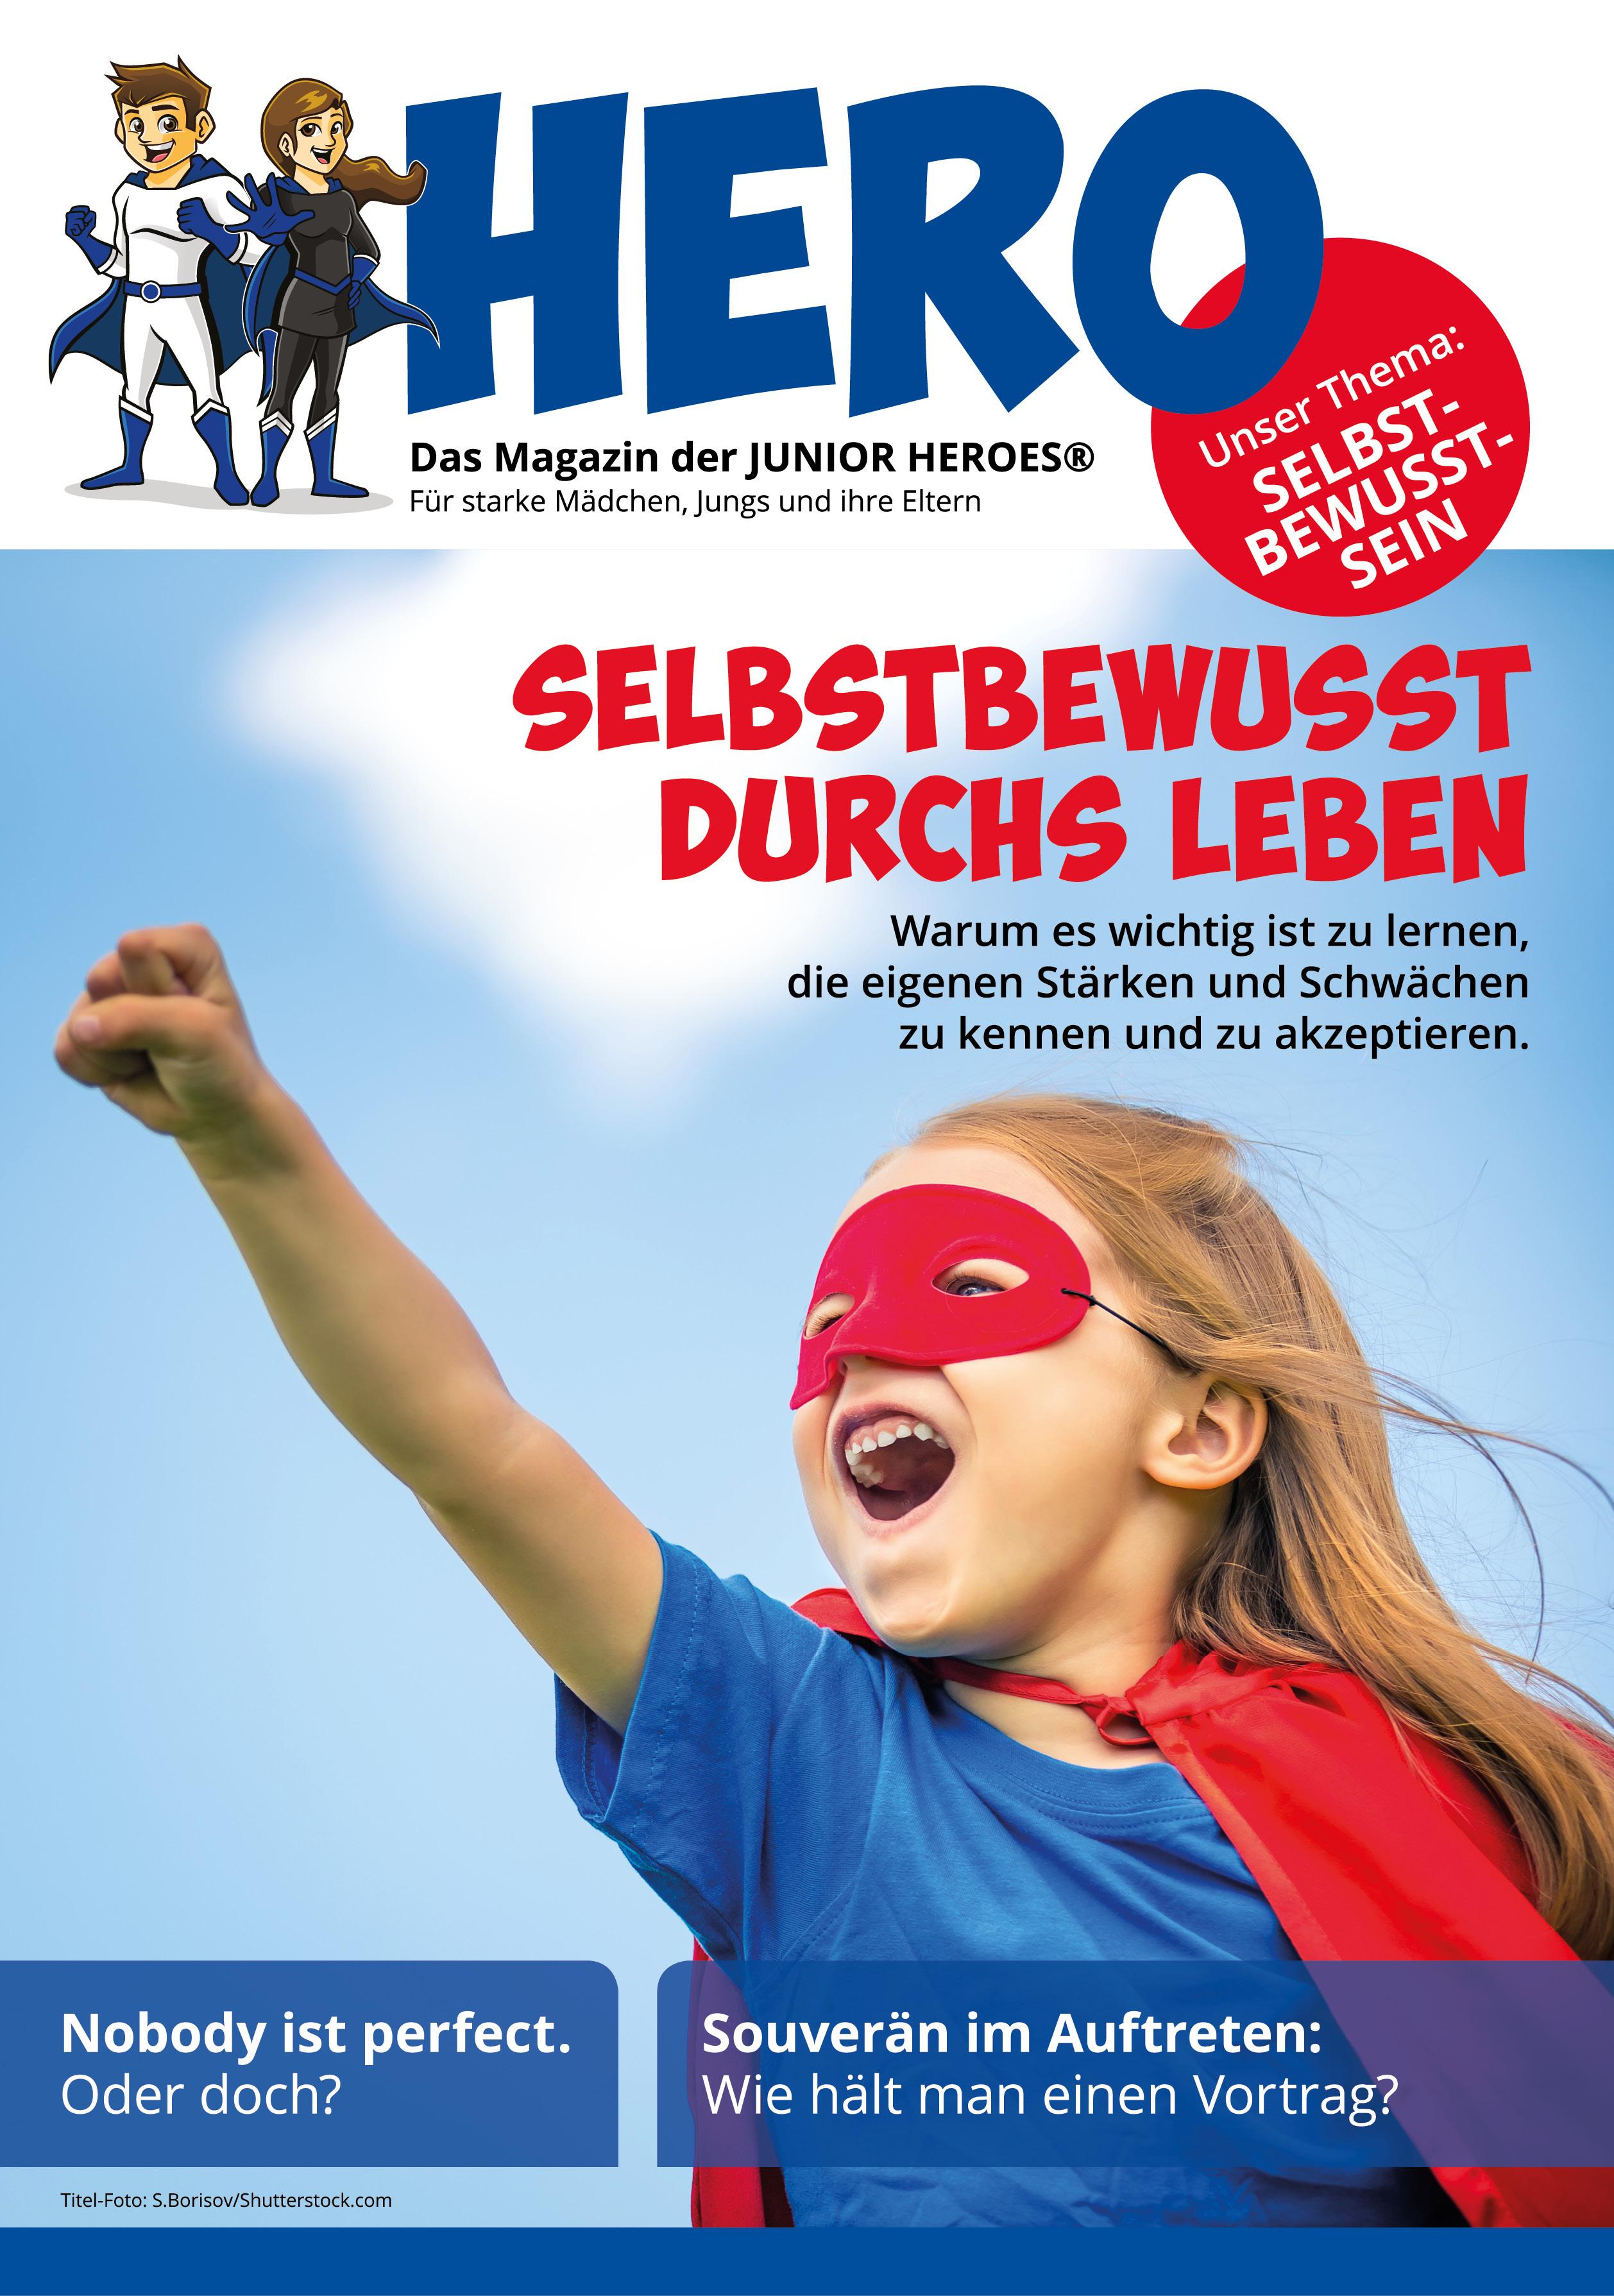 HERO Magazin 05 Thema Selbstbewusstsein